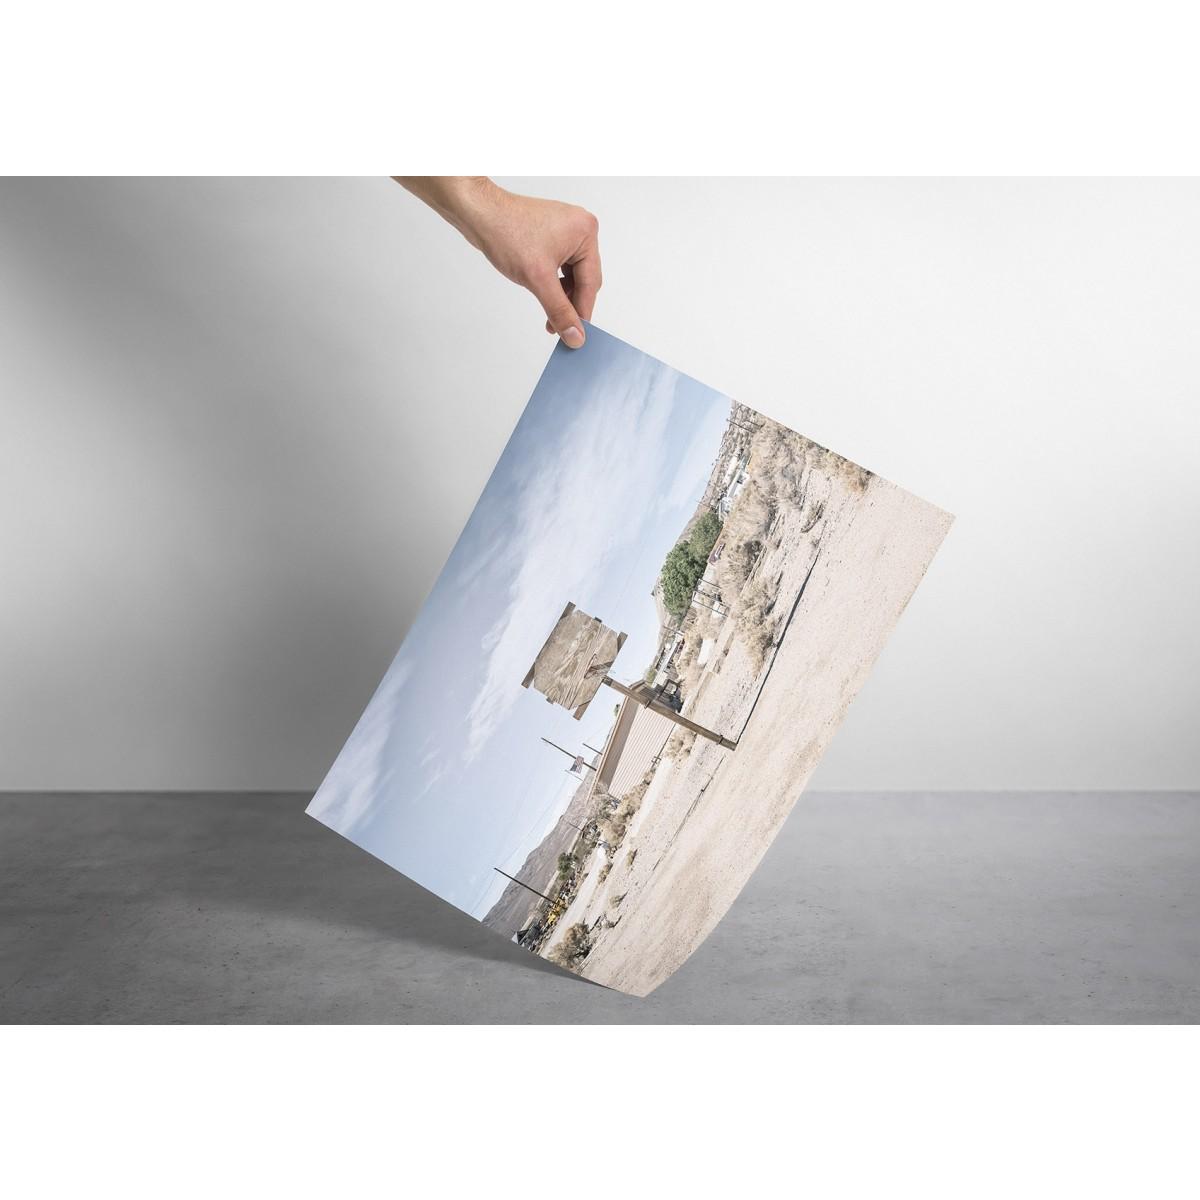 JOE MANIA / Modern Artprint Poster / Streetball Courts 2 (California, USA) DIN A4 - A0